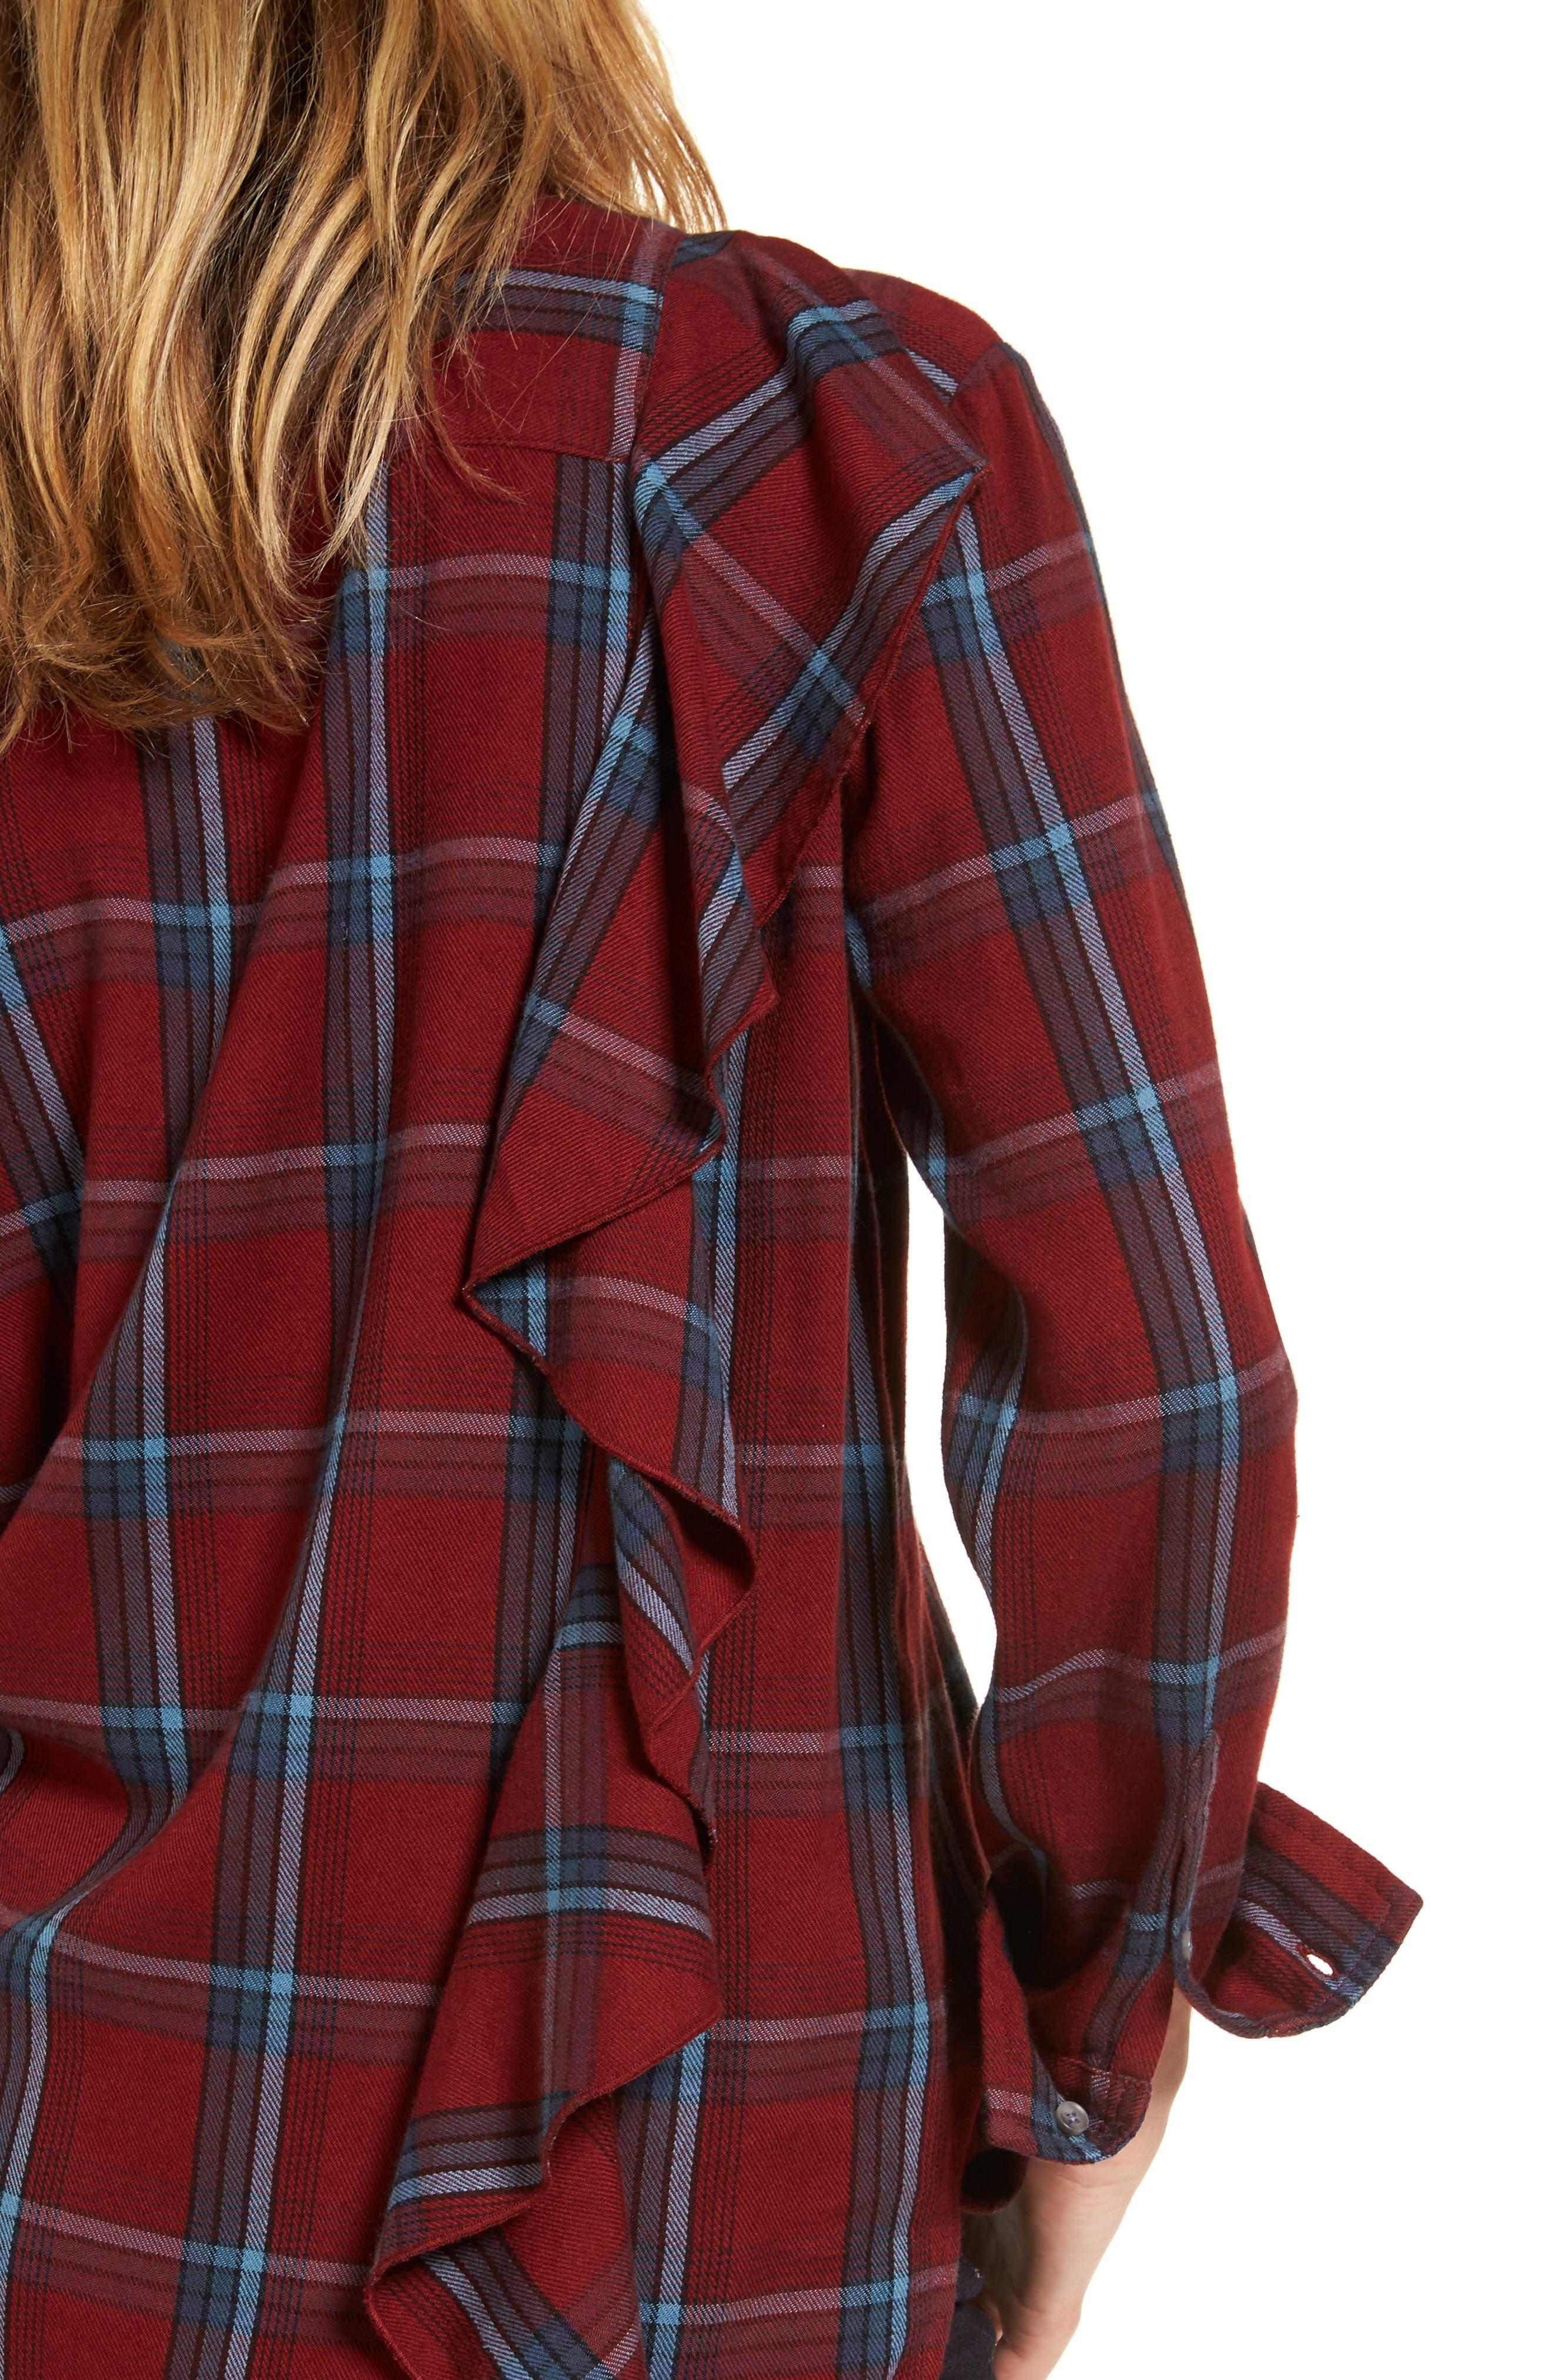 Ruffle Plaid Boyfriend Shirt,                             Alternate thumbnail 4, color,                             Red Syrah Three Box Tartan